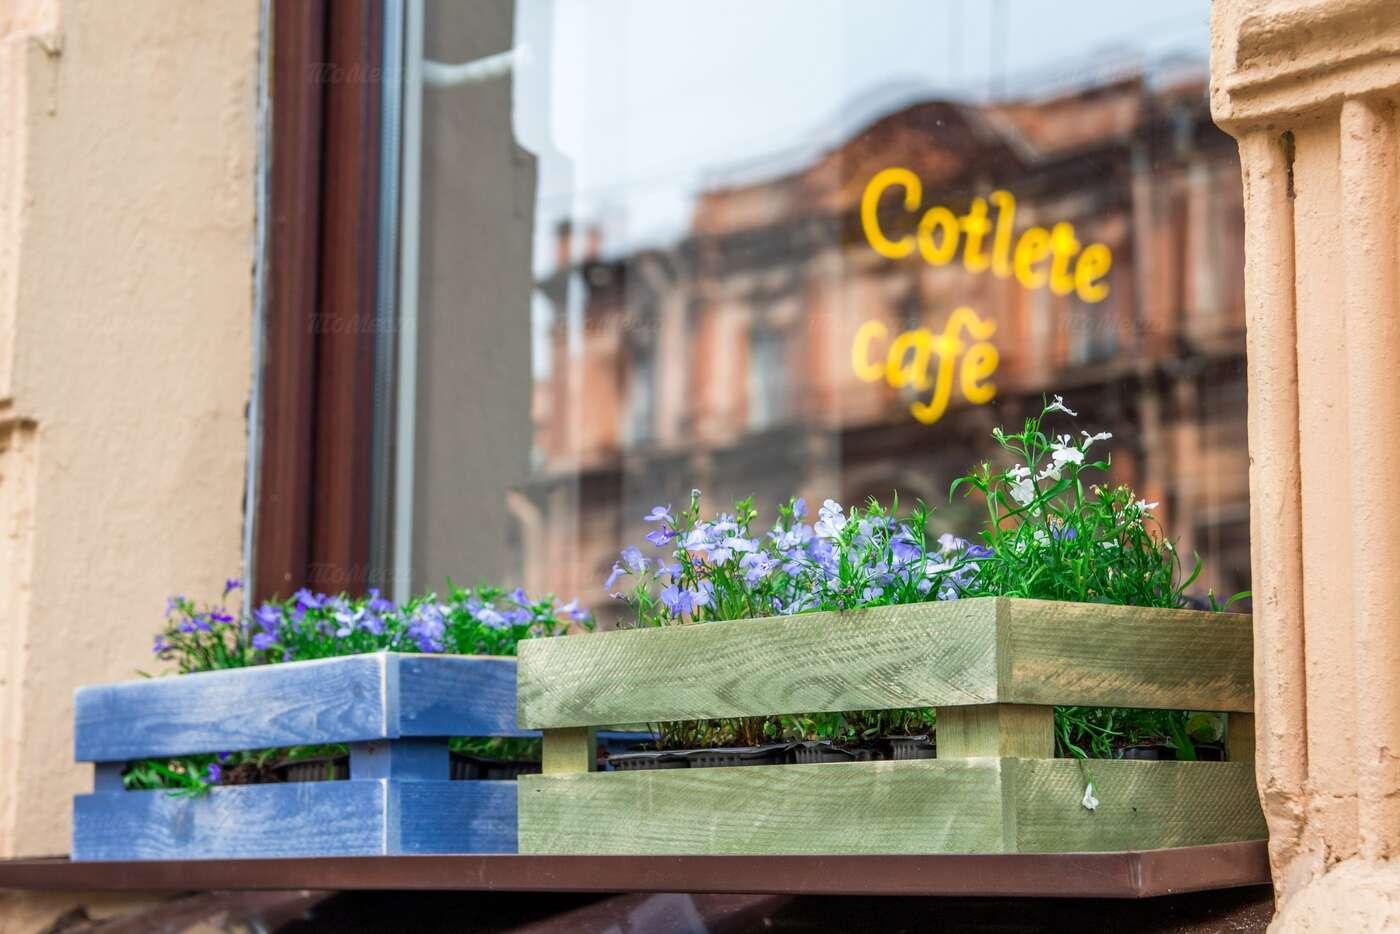 Кафе Le Cotlete Cafe на Чайковского фото 13